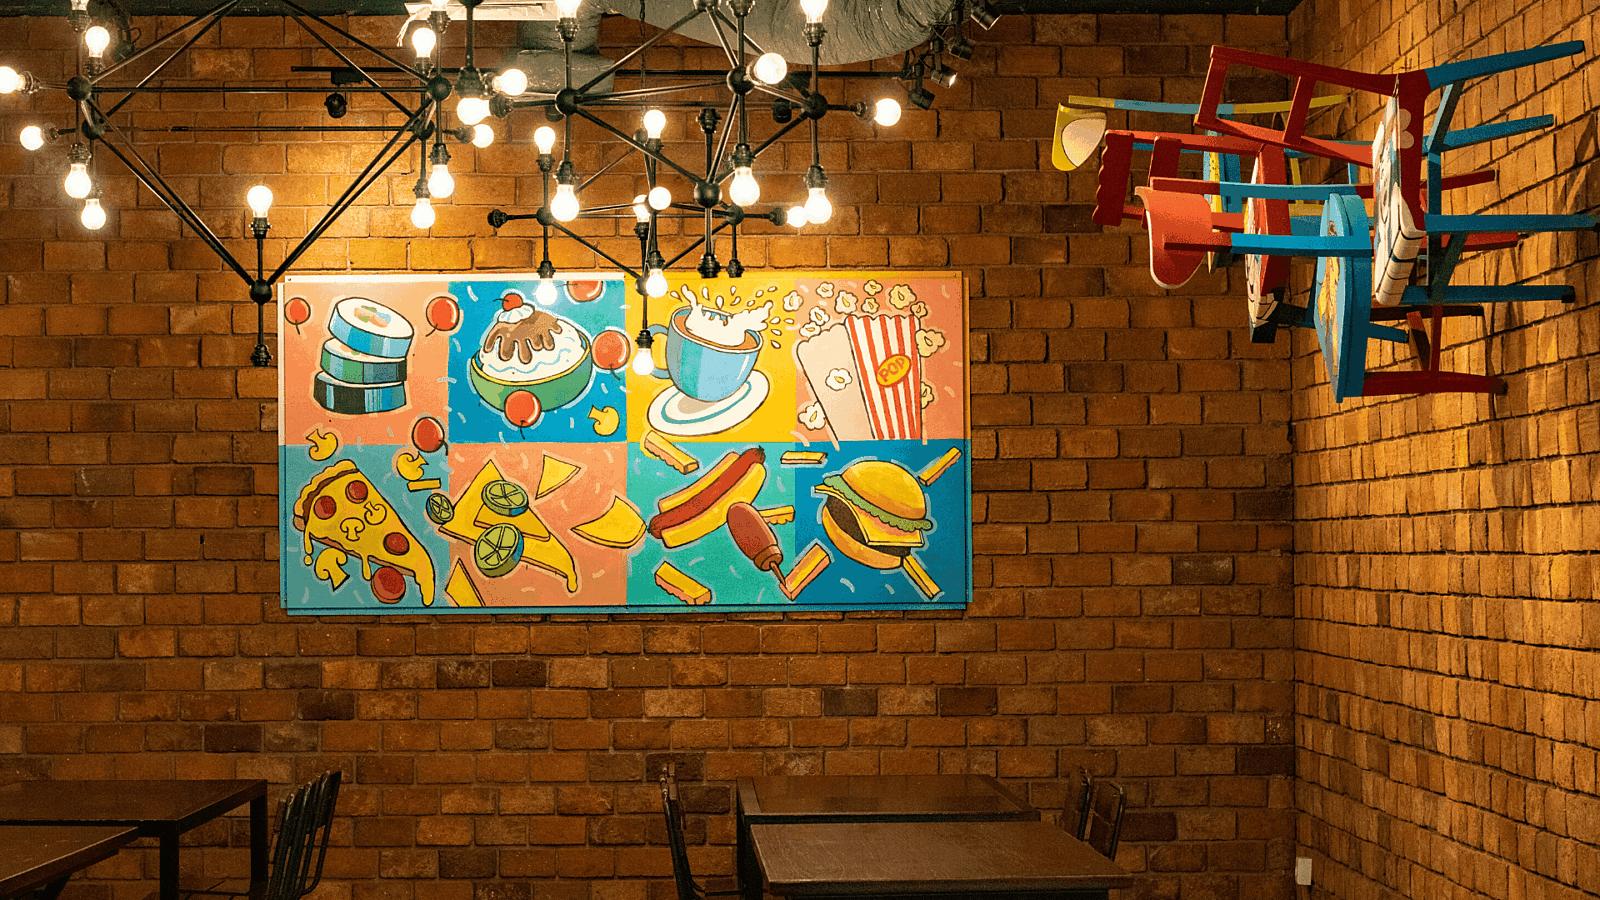 44 Unique Restaurant Ideas to Inspire Your Concept 1